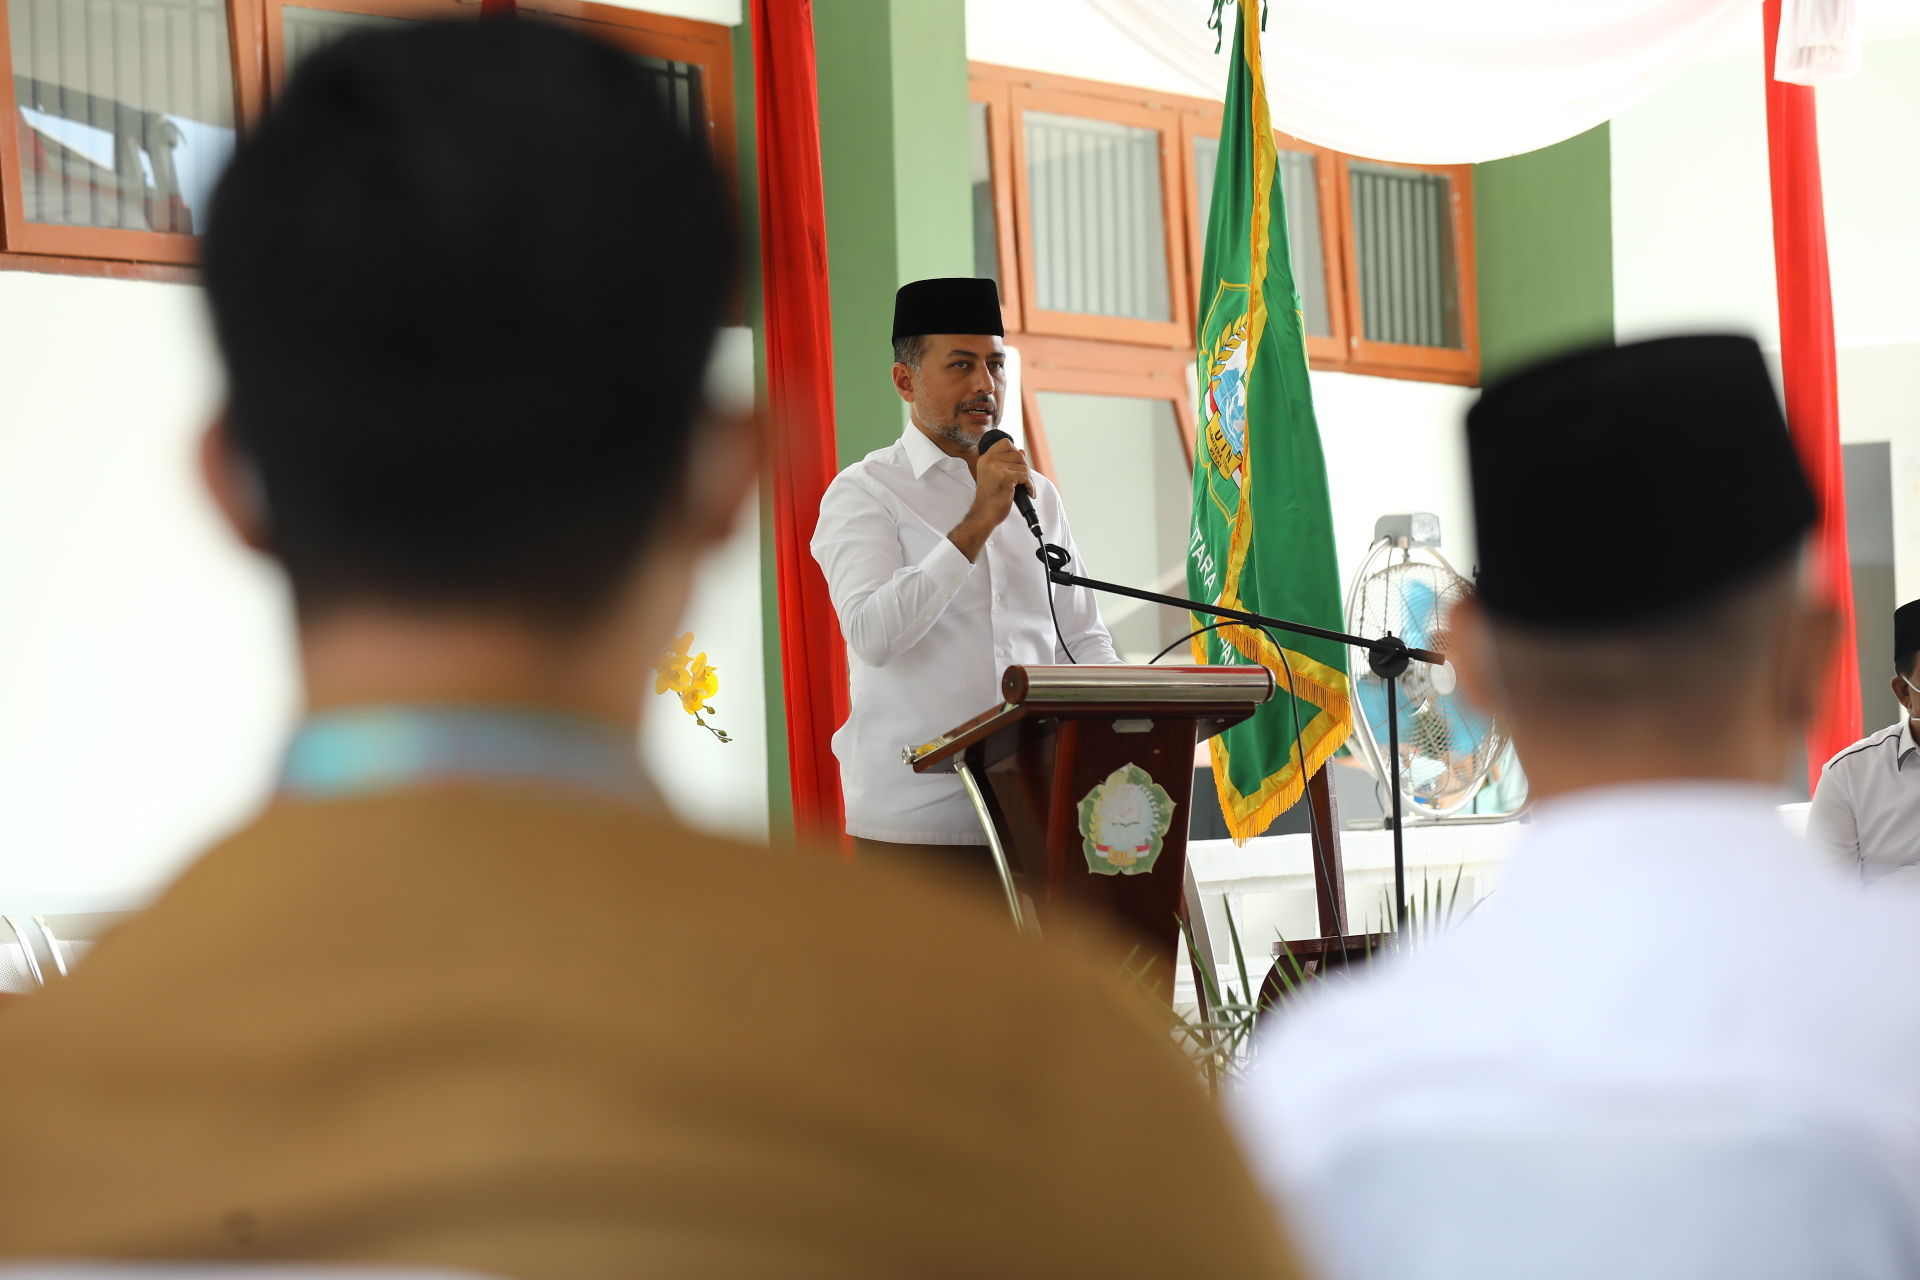 Wagub Musa Rajekshah Resmikan Klinik Ulul Albab UINSU